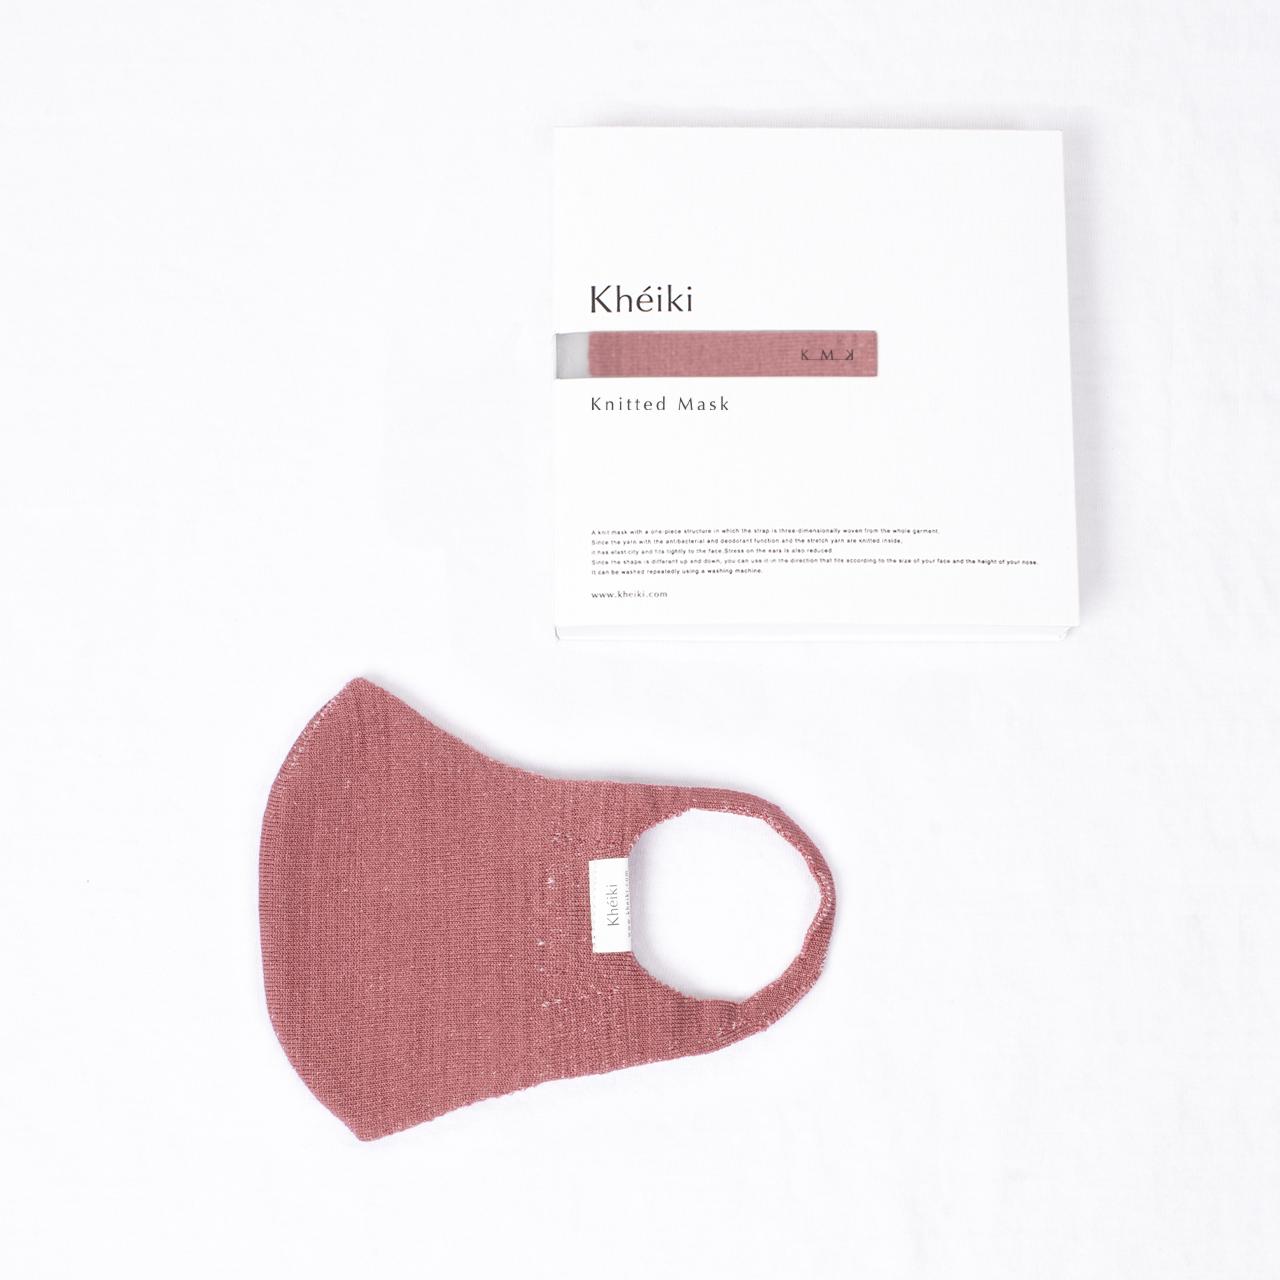 Knitted Mask 2pcs Set / KMK / Mercerized Long Staple Cotton / #Cochineal Red